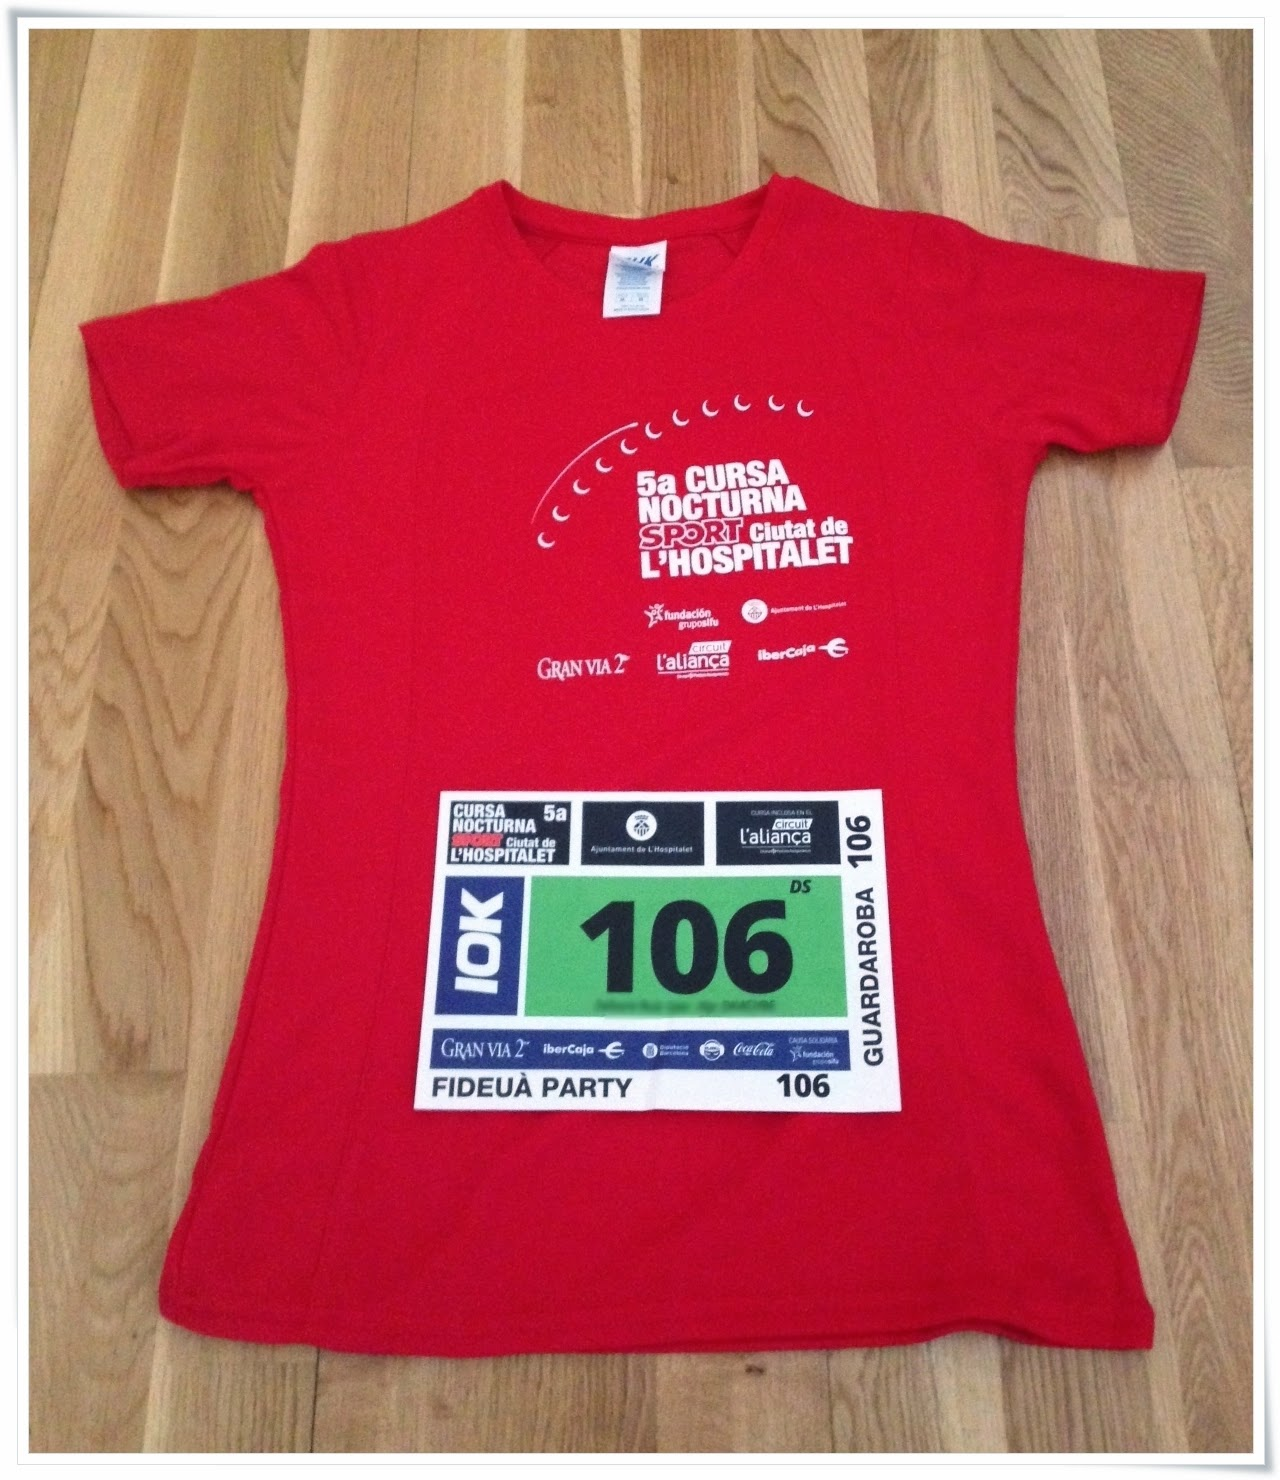 Cursa Nocturna l'Hospitalet 2014 camiseta